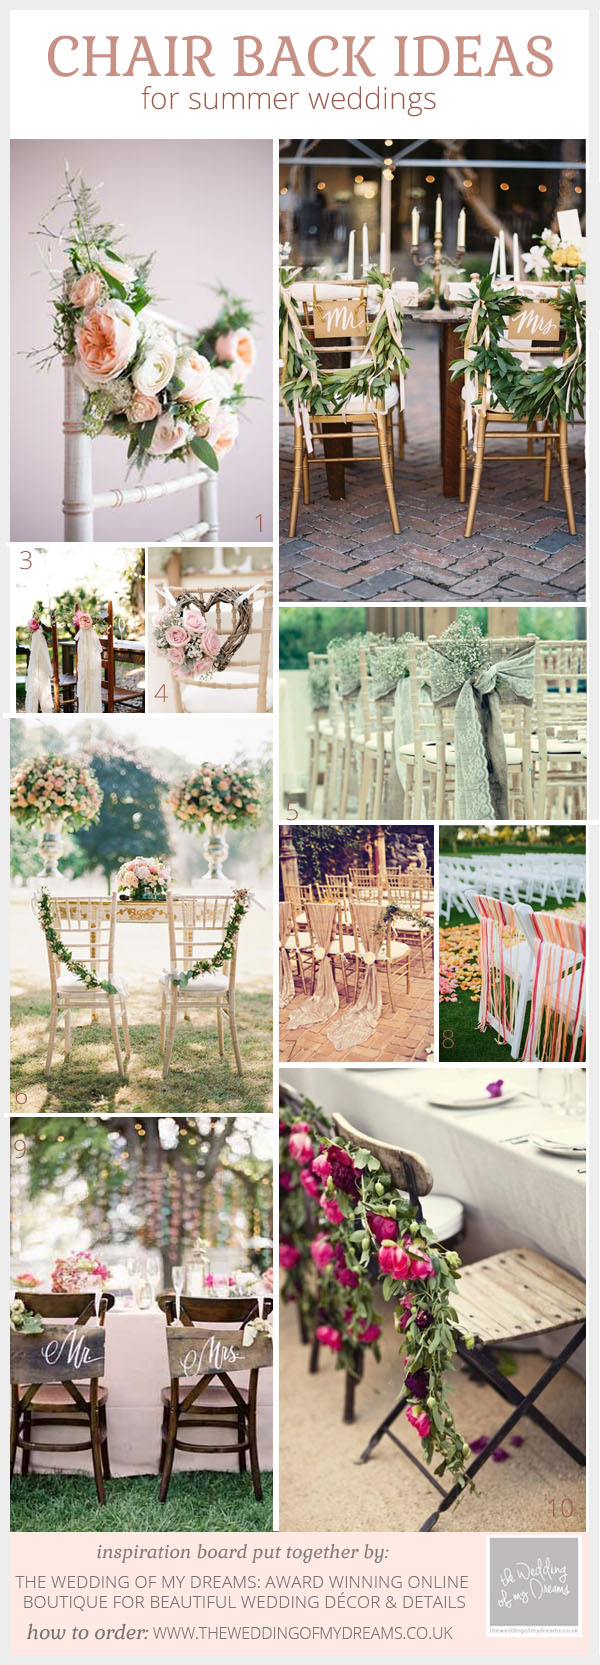 Pretty chair back ideas for summer weddings